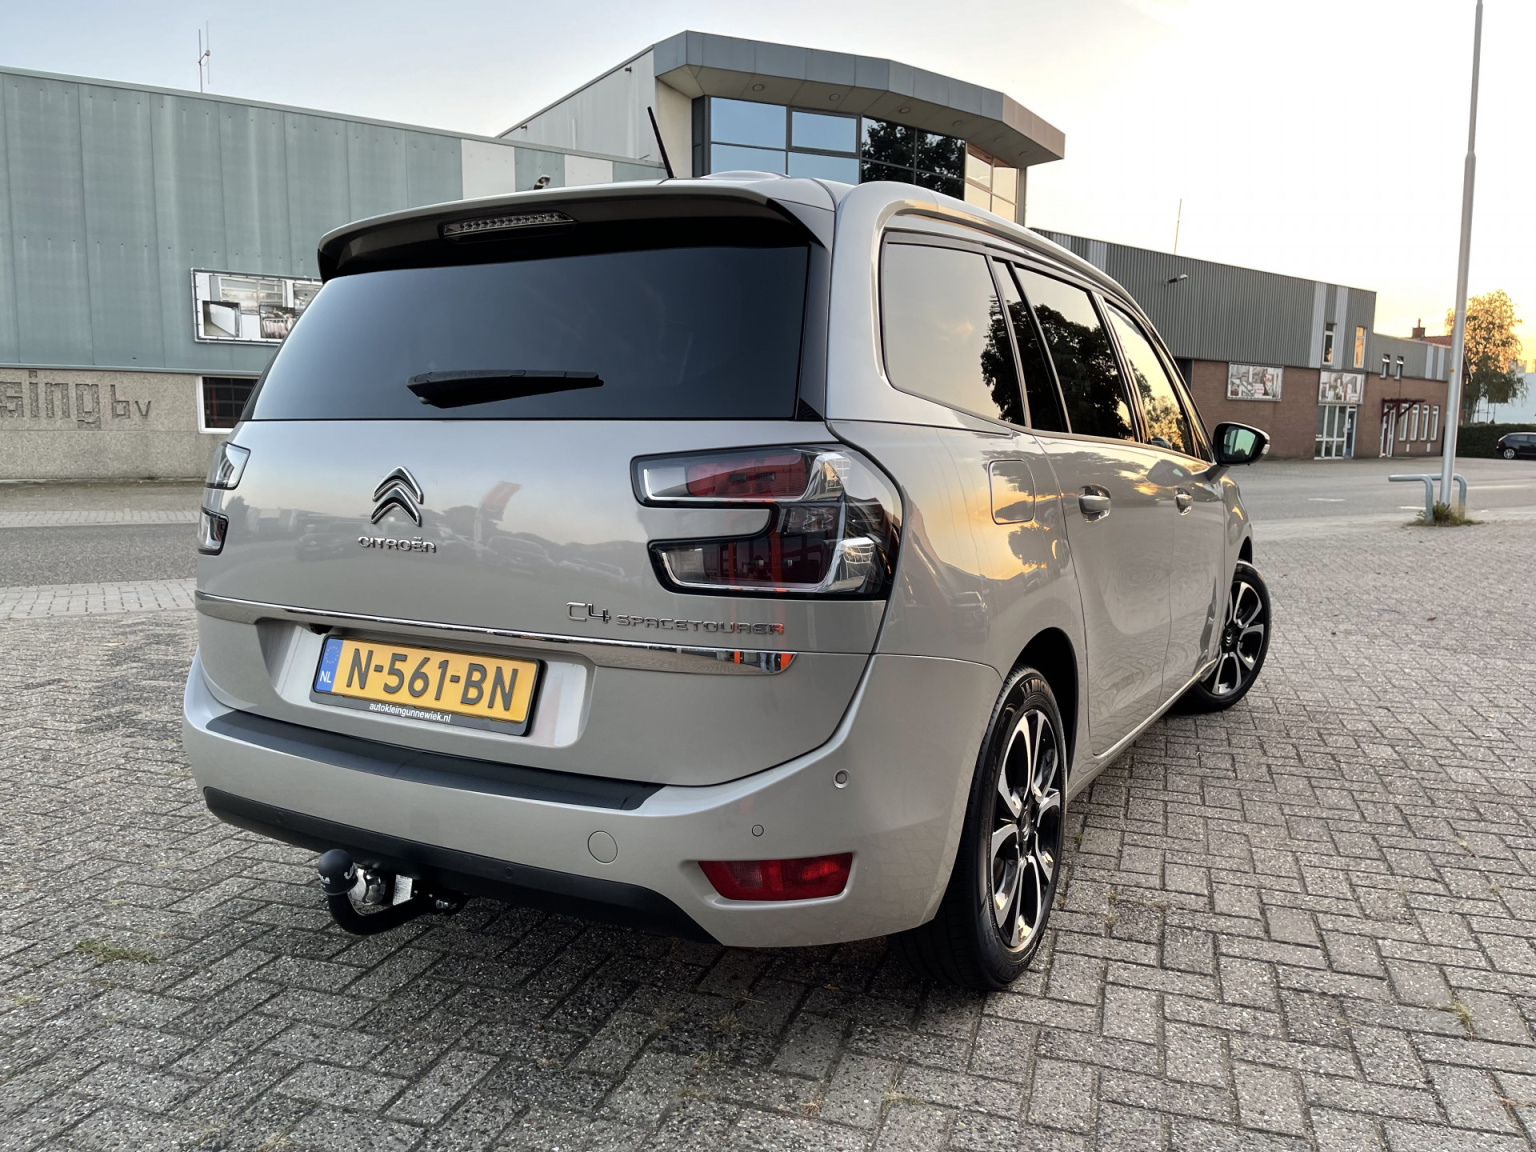 Citroën-Grand C4 Spacetourer-5